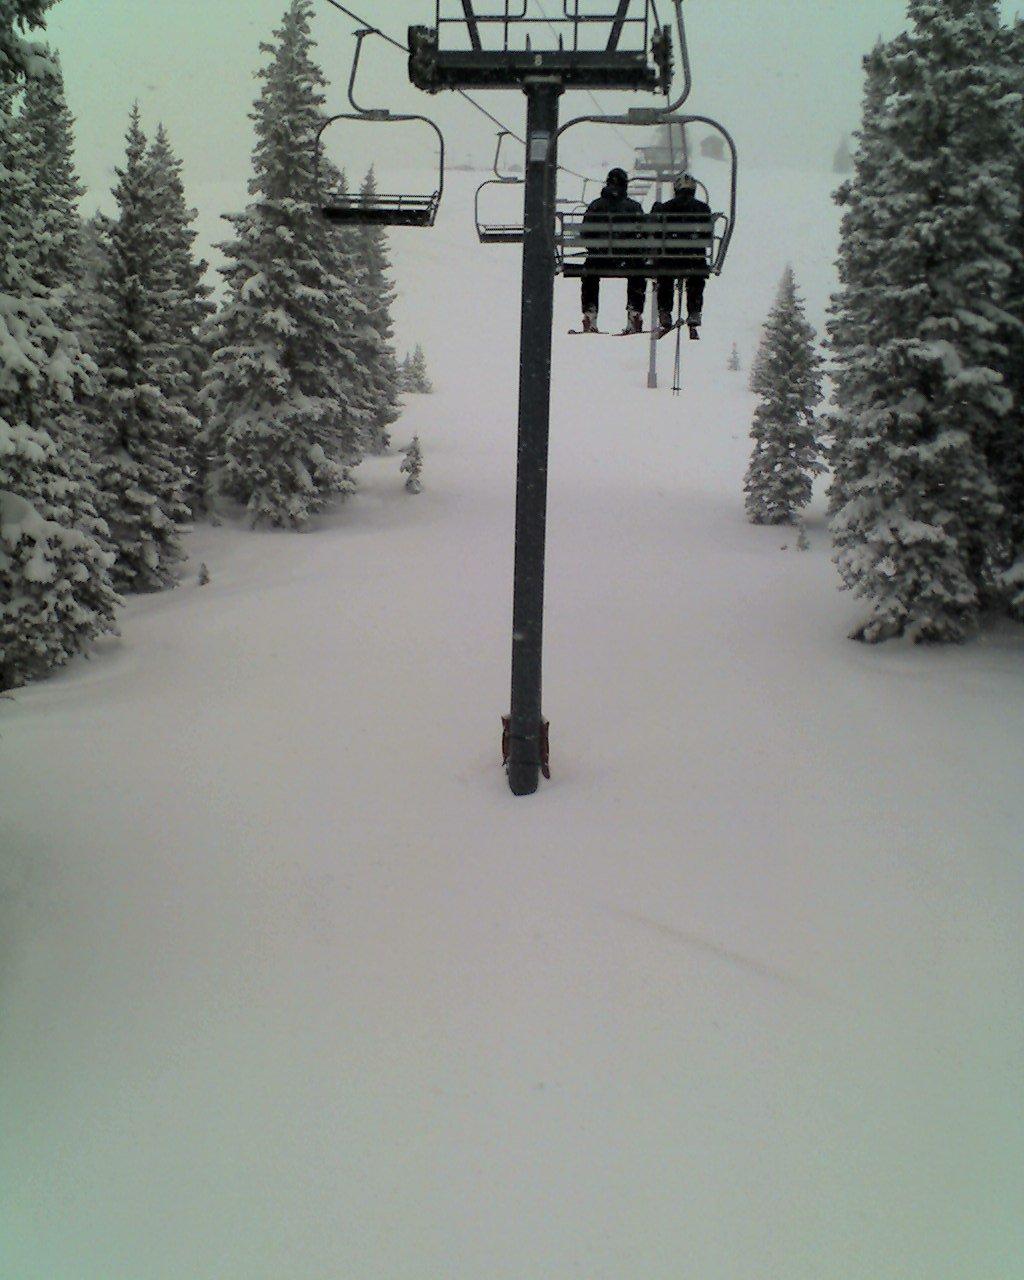 Skiing - 13 of 18